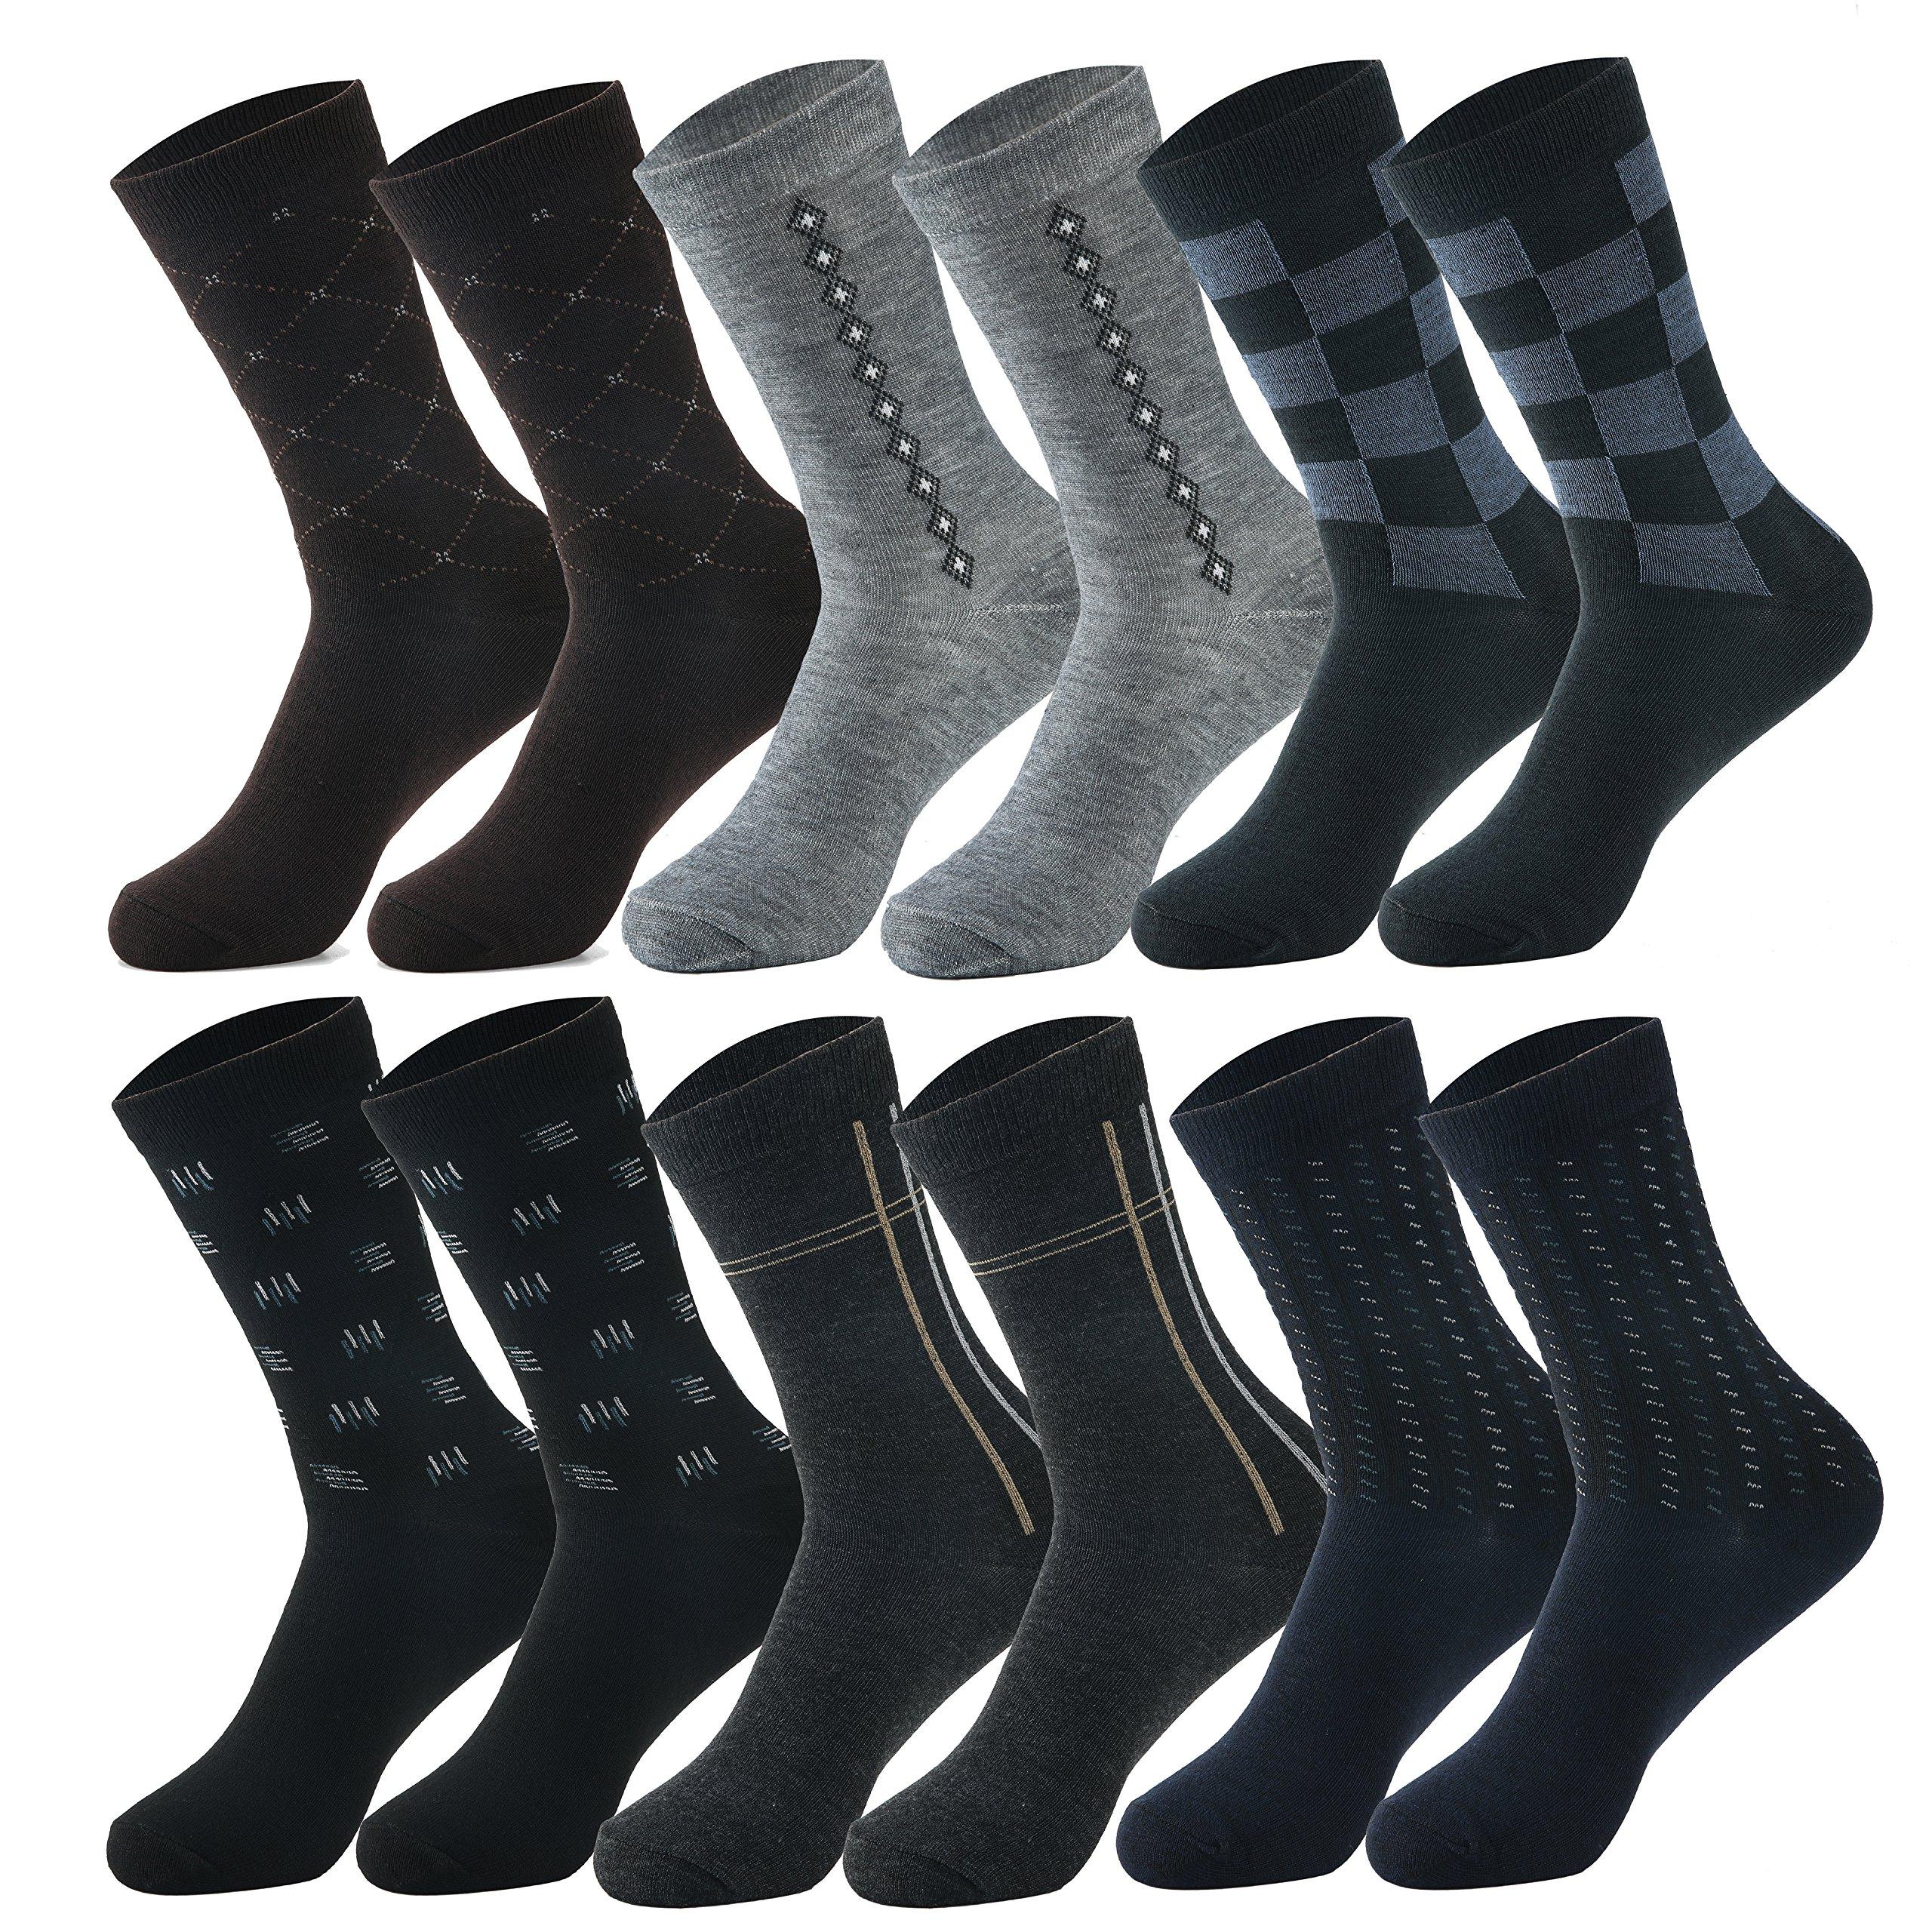 Zakka Republic 12 Pairs Men Fashion Dress Socks Multi Colored & Pattern (SCK-02)